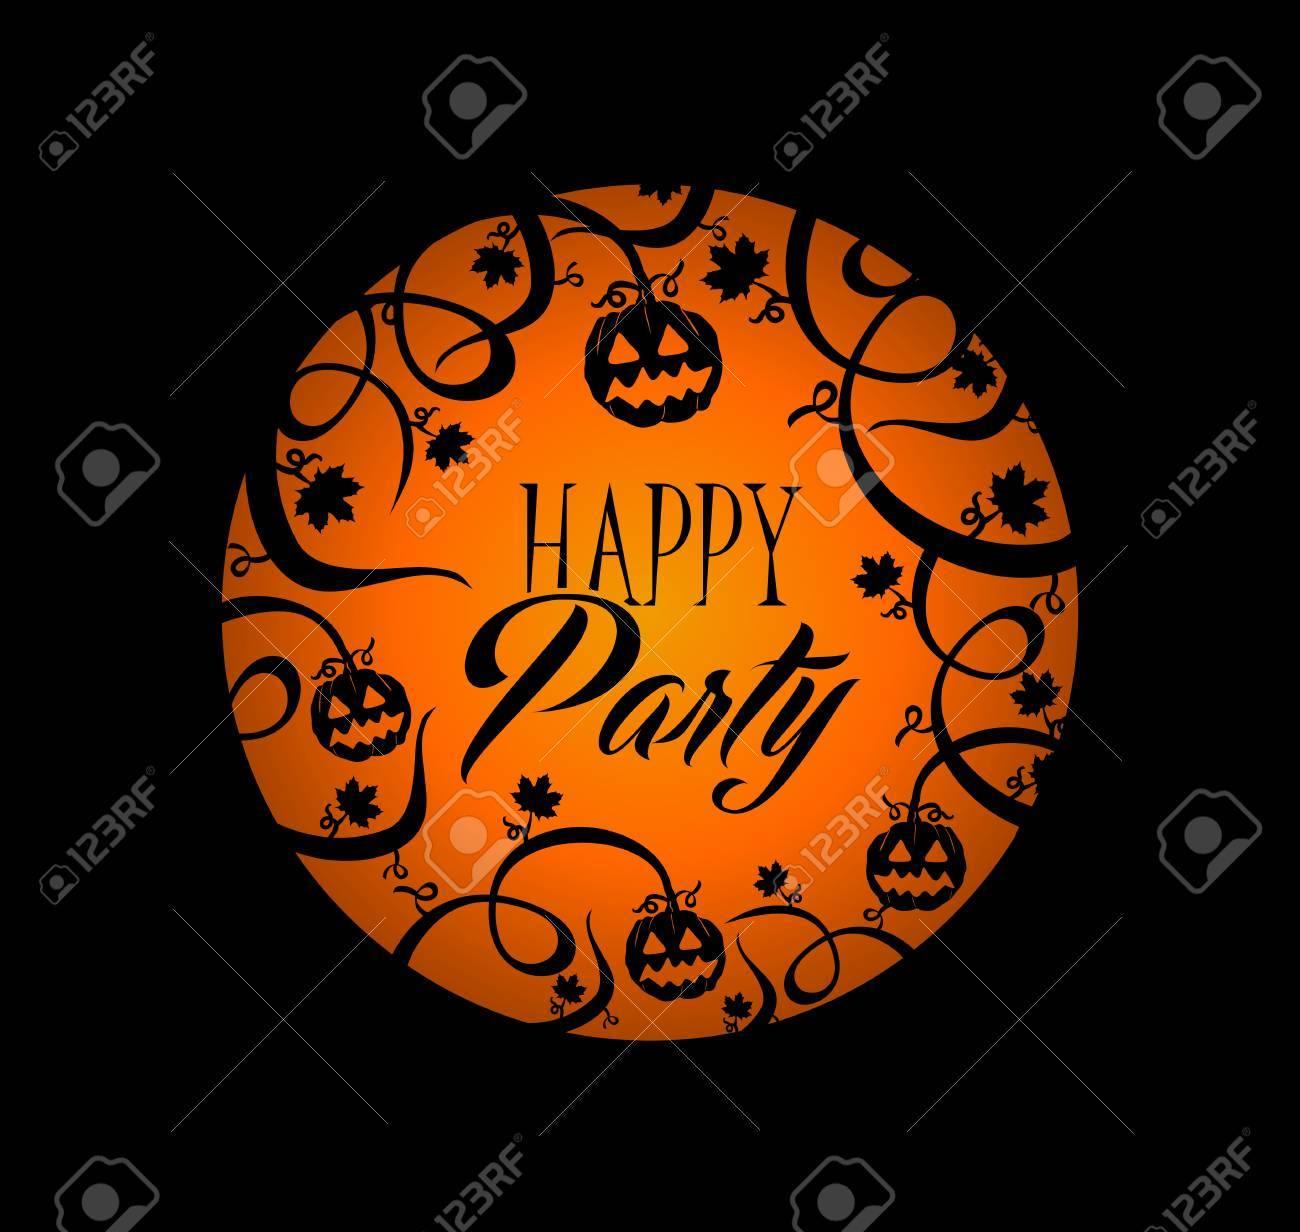 Happy Party Halloween Text Over Orange Full Moon With Pumpkin ...